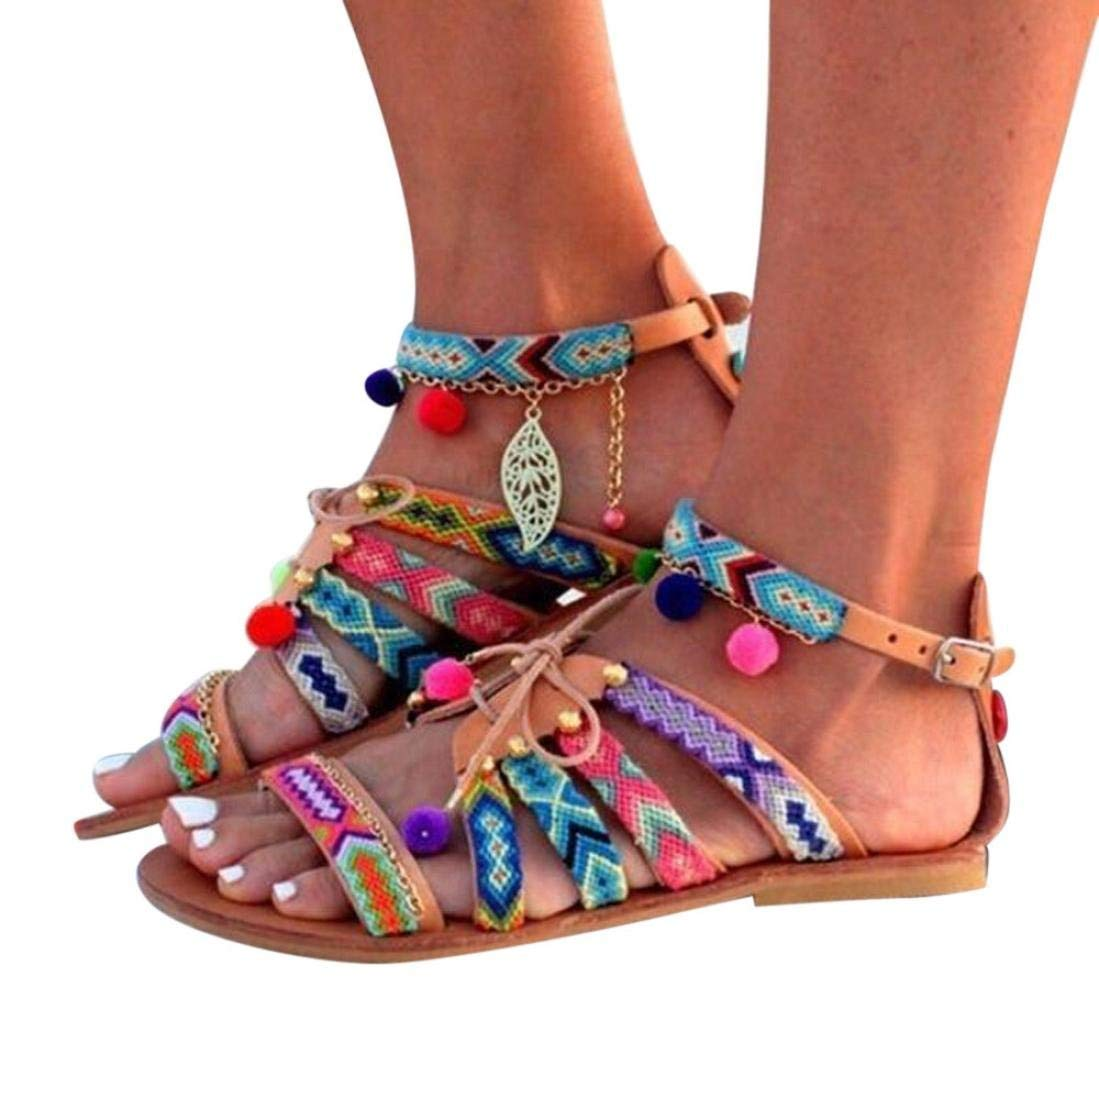 Sandals,Clearance!!Duseedik Women Flat Sandals Summer Flat Shoes Ladies Flip Flops Bohemia Sandals Leather Sandals Flats Shoes Pom-Pom Sandals Beach Sandals for Women (Multicolor, US:7.5(CN:40))